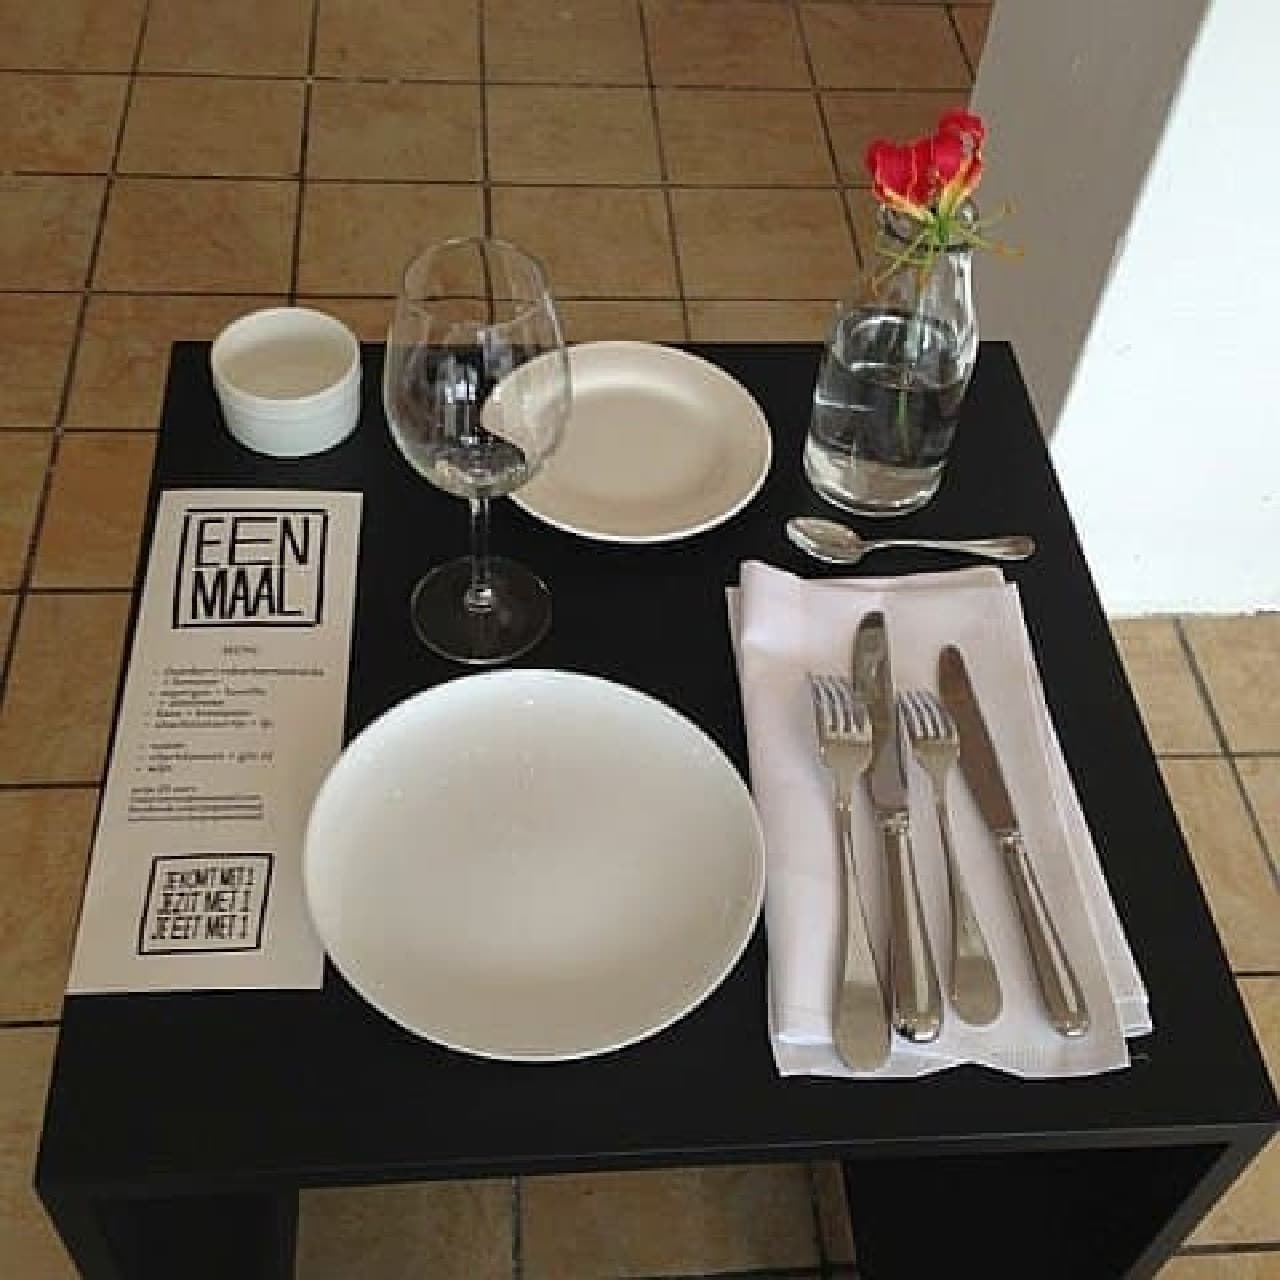 「Eenmaal」のテーブルはお一人様サイズ  カップルでは座れません!